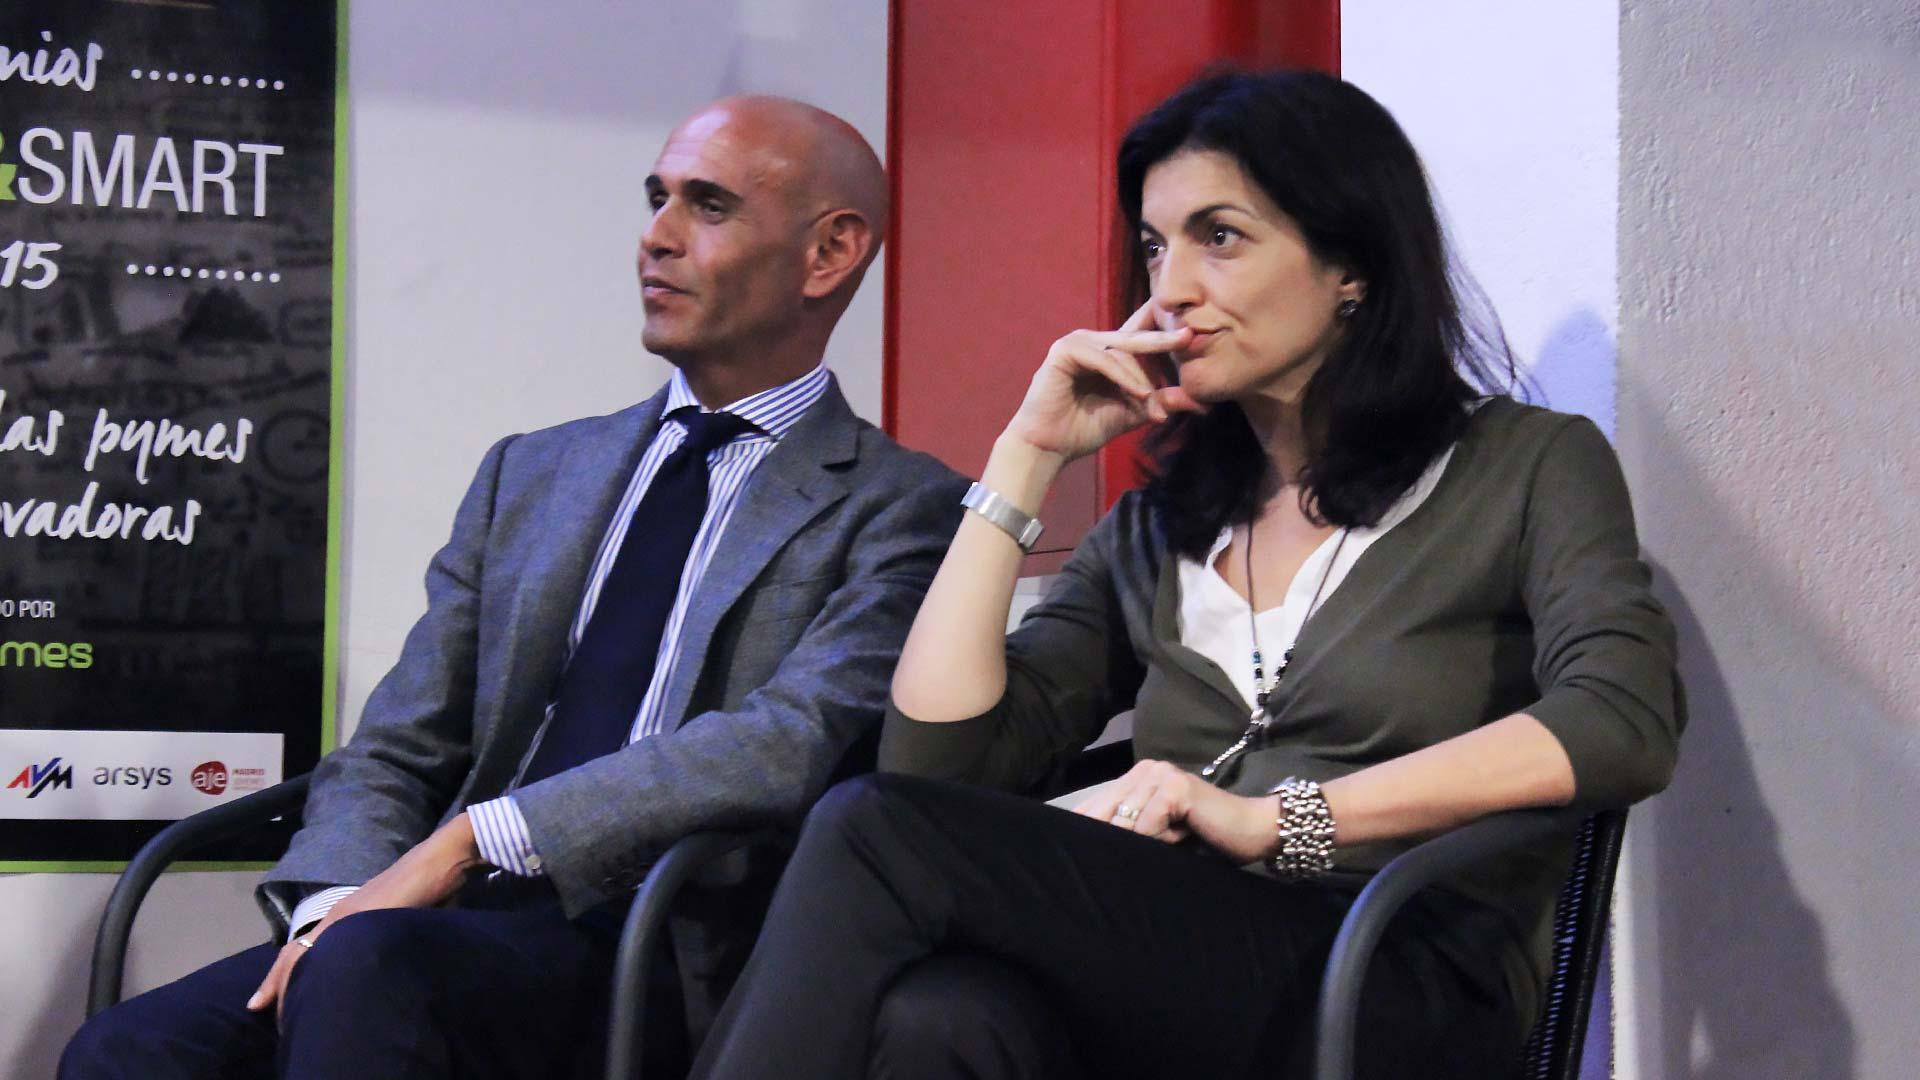 smallsmart-premios-startups-pymes-2015-debate-2